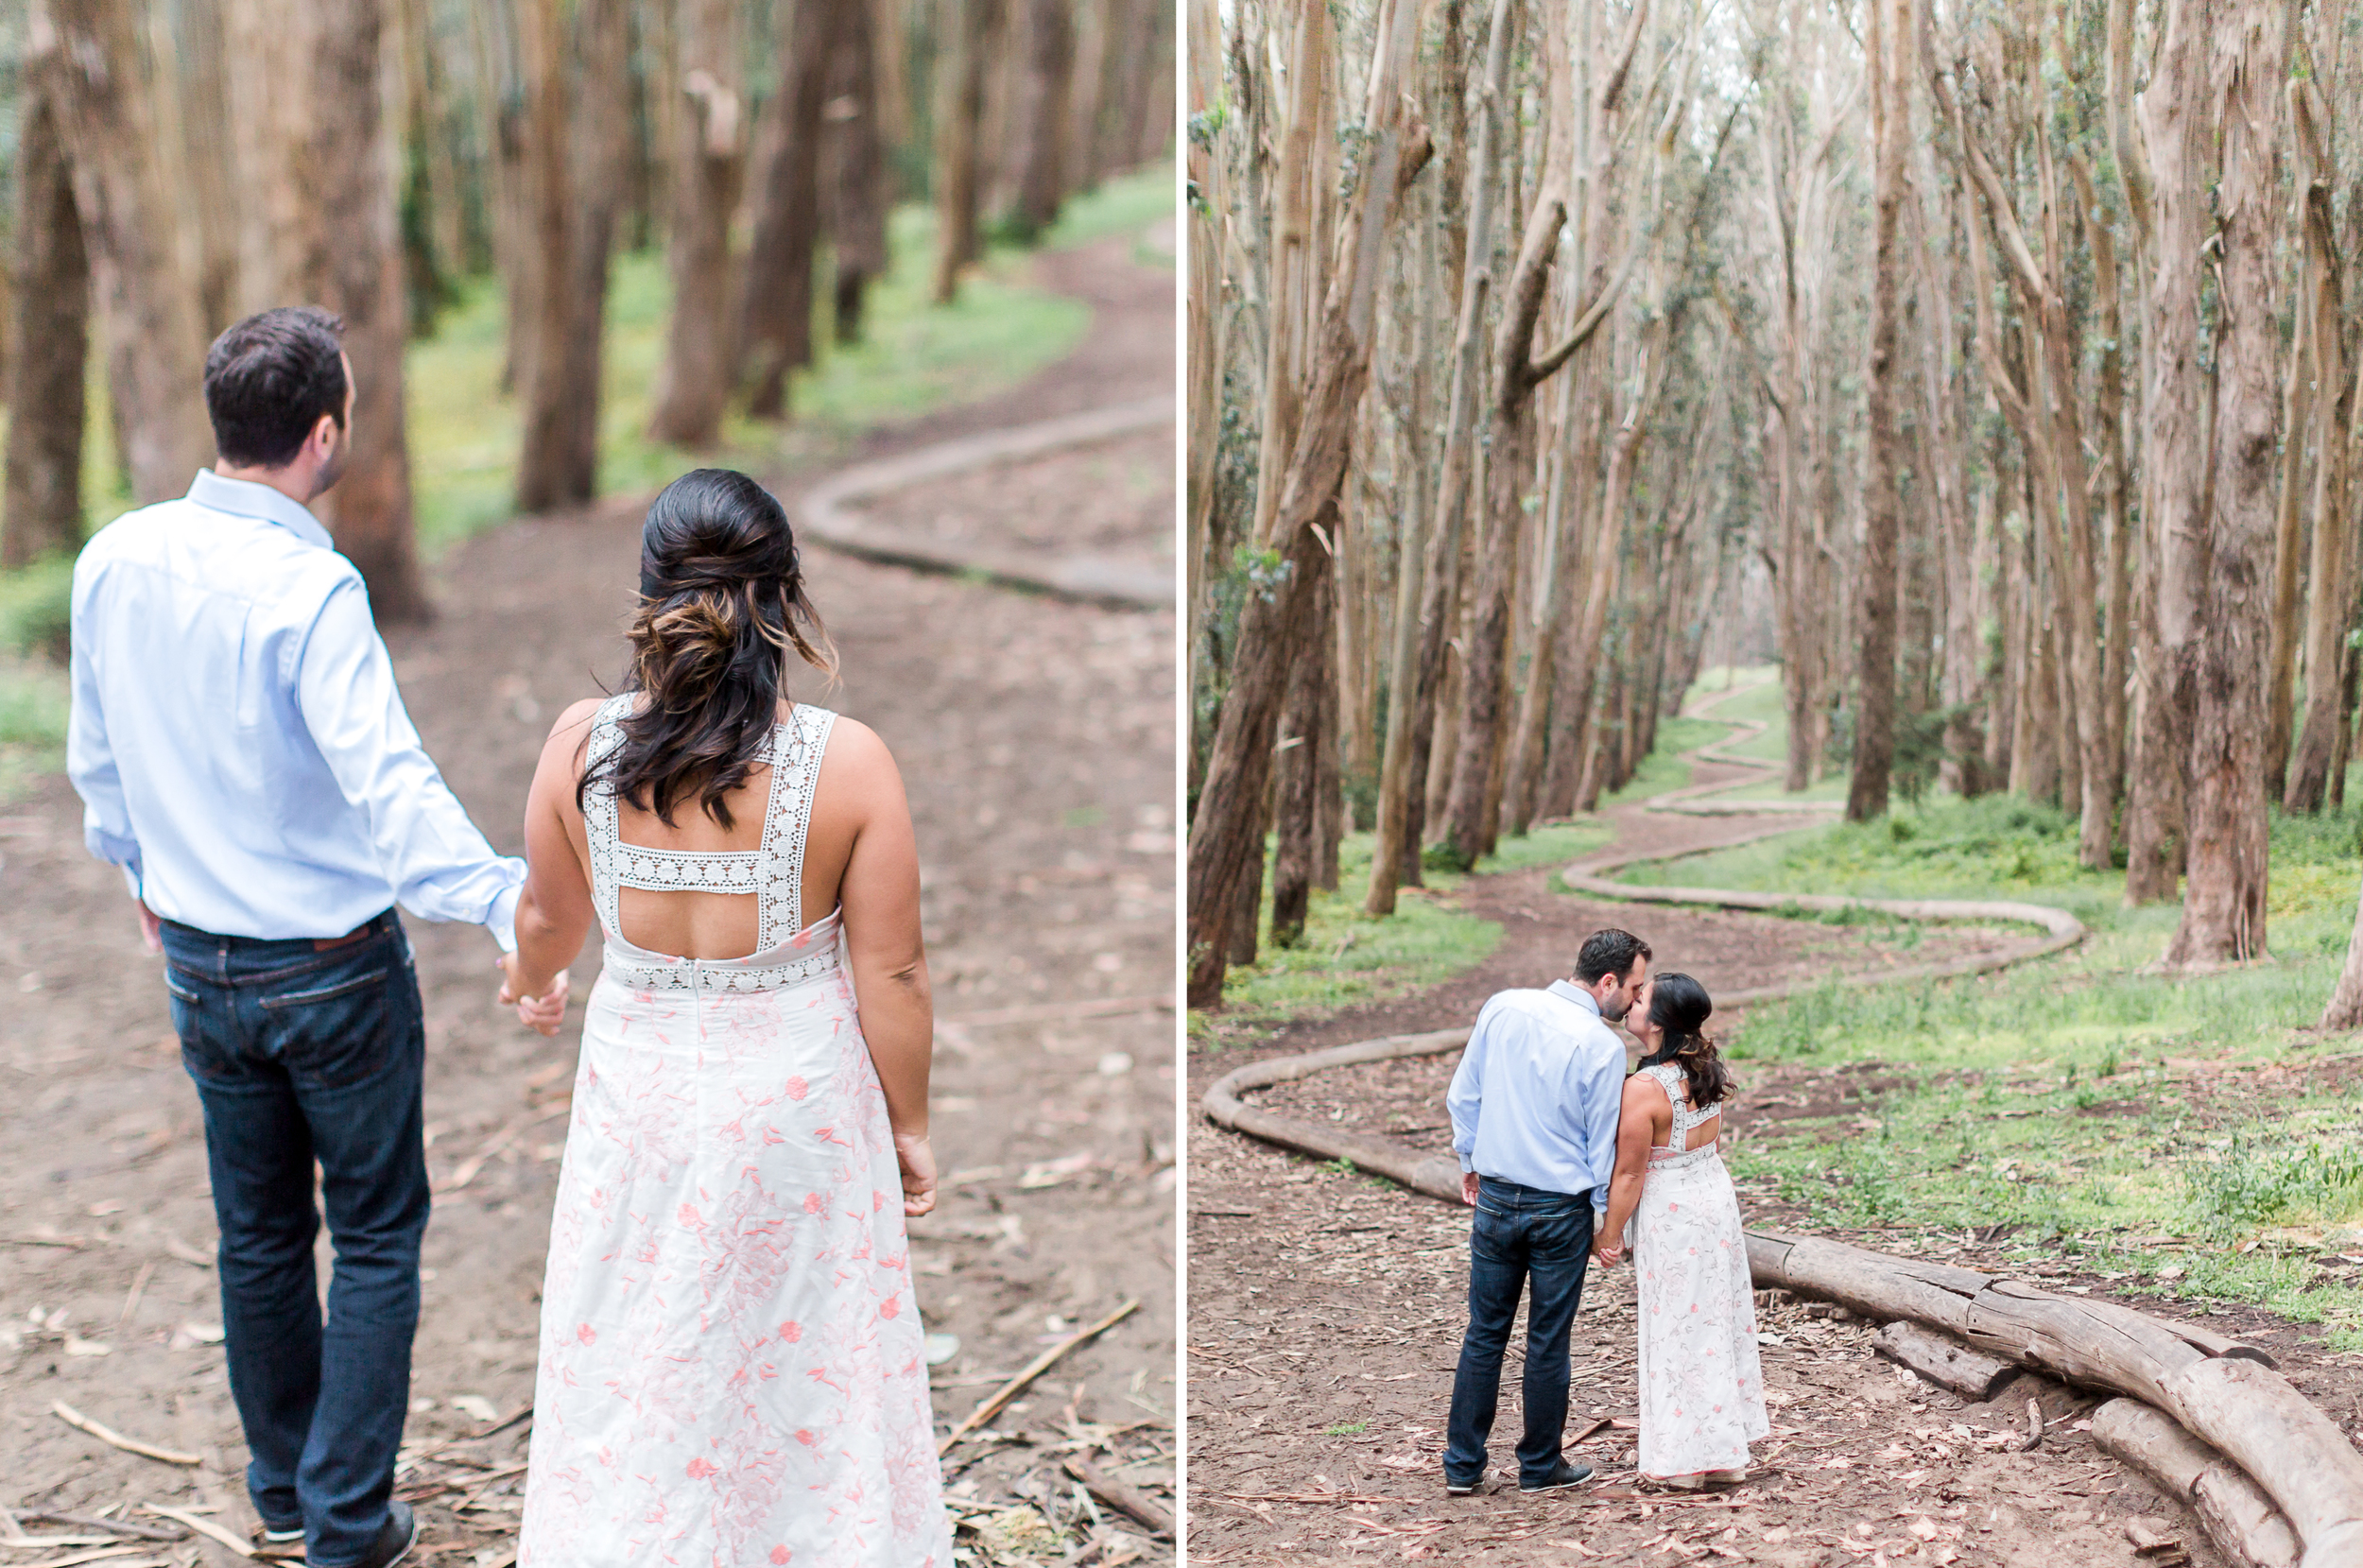 lovers-lane-san-francisco-california-engagement-photography.jpg